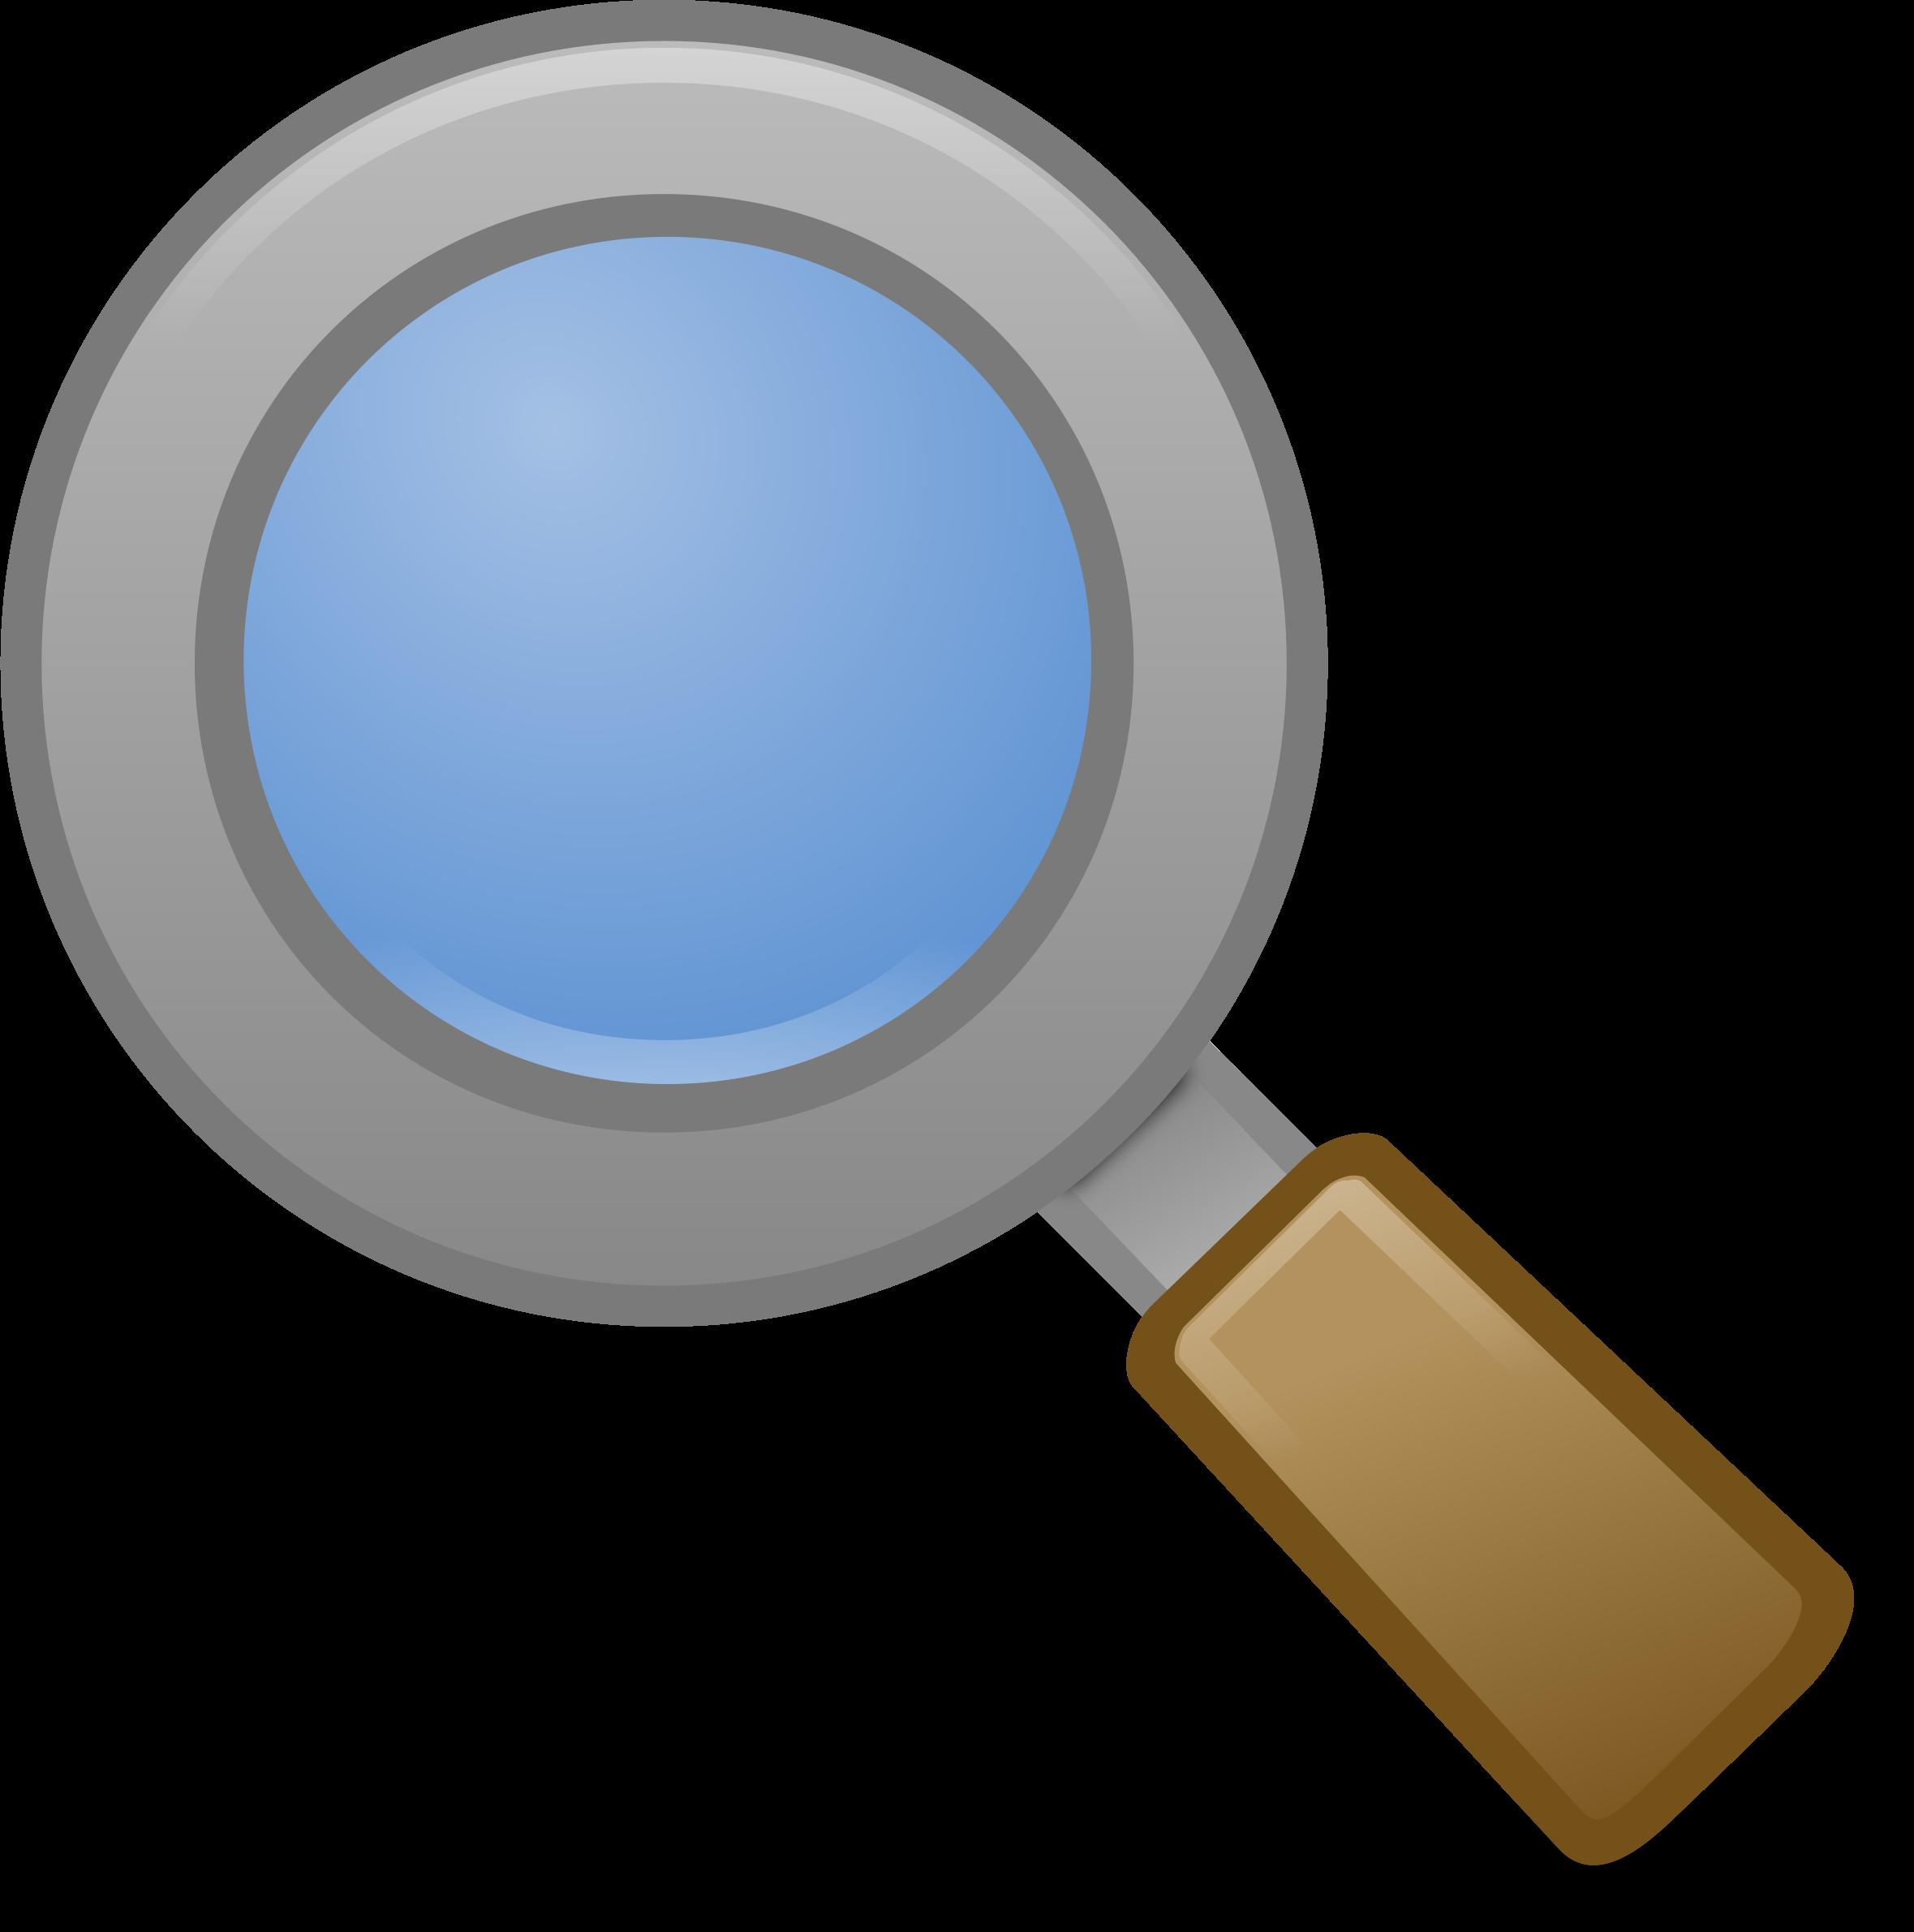 Search and seizure clipart clip art transparent library Clipart search icon - ClipartFest clip art transparent library